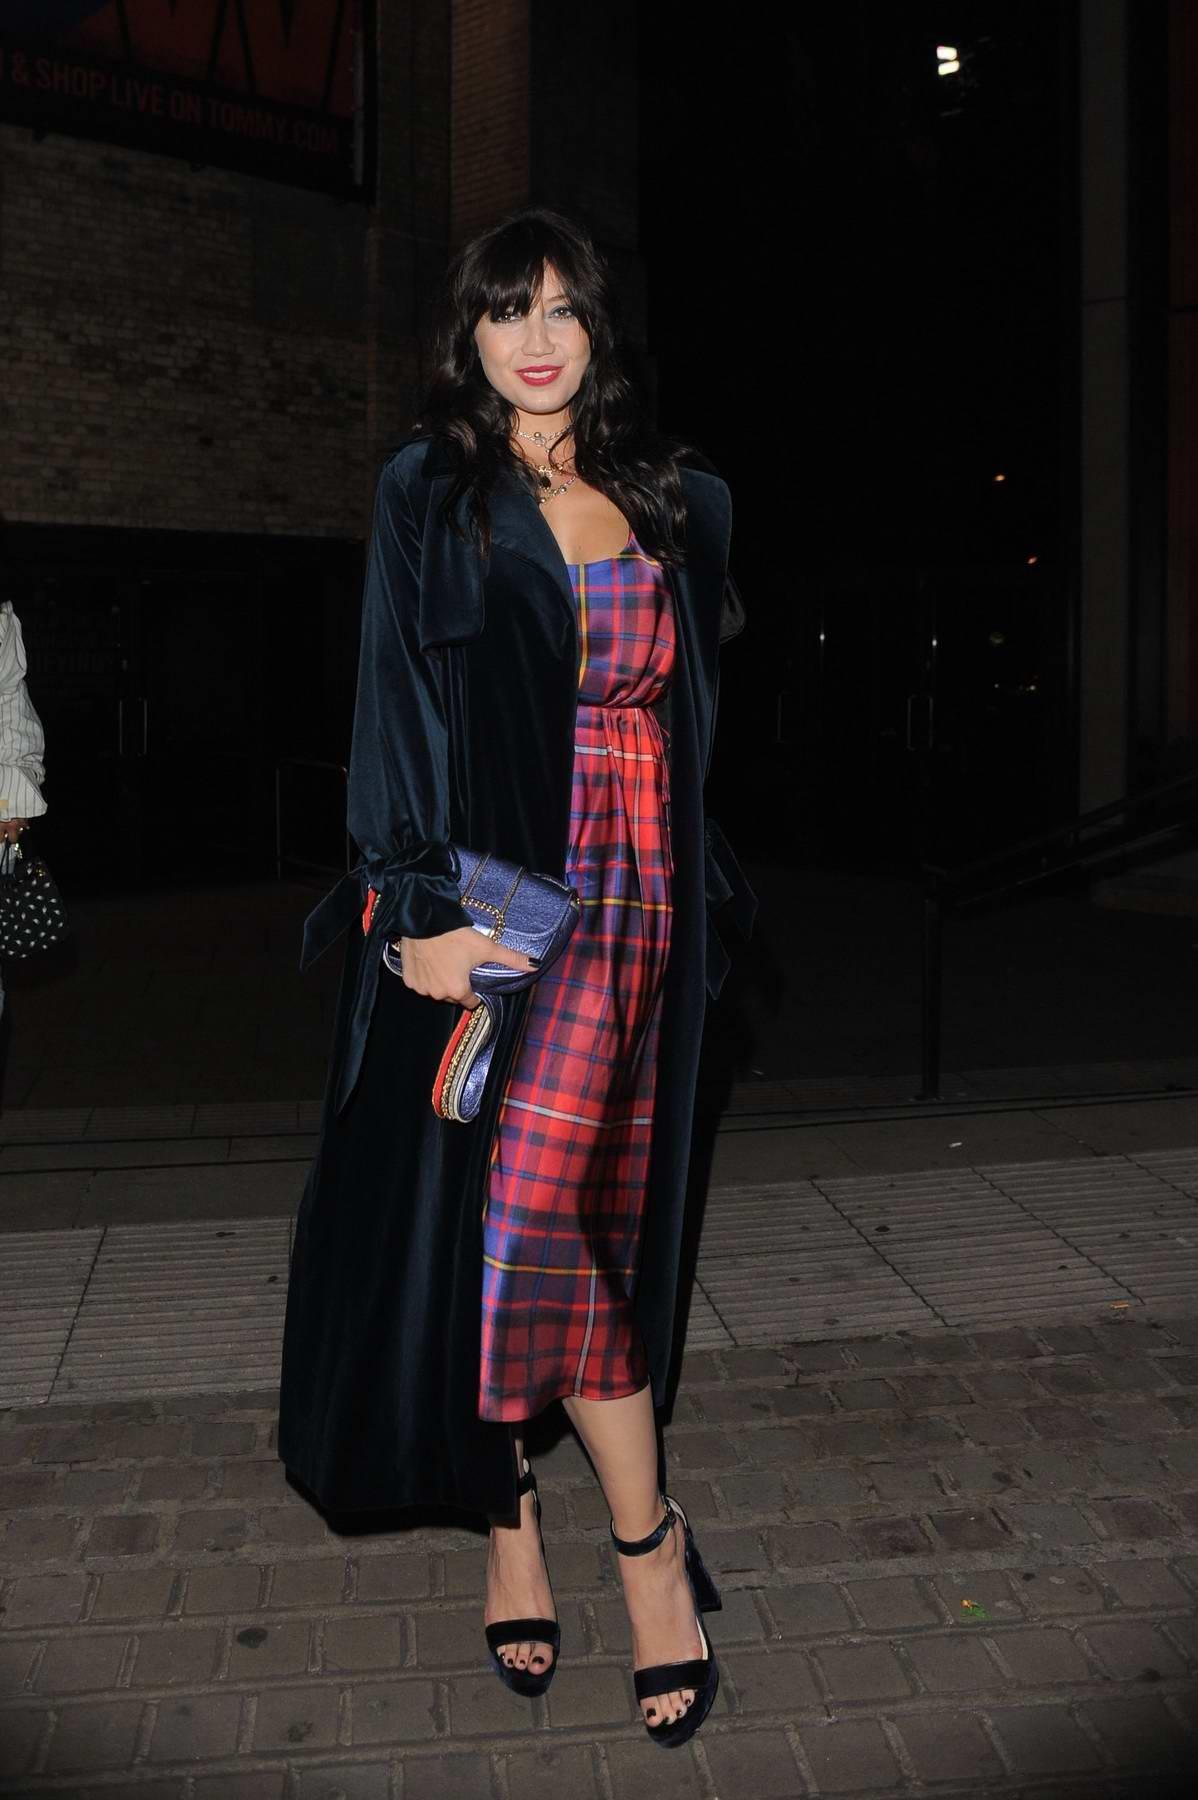 Daisy Lowe leaves the Gigi Hadid X Tommy Hilfiger show during London Fashion Week